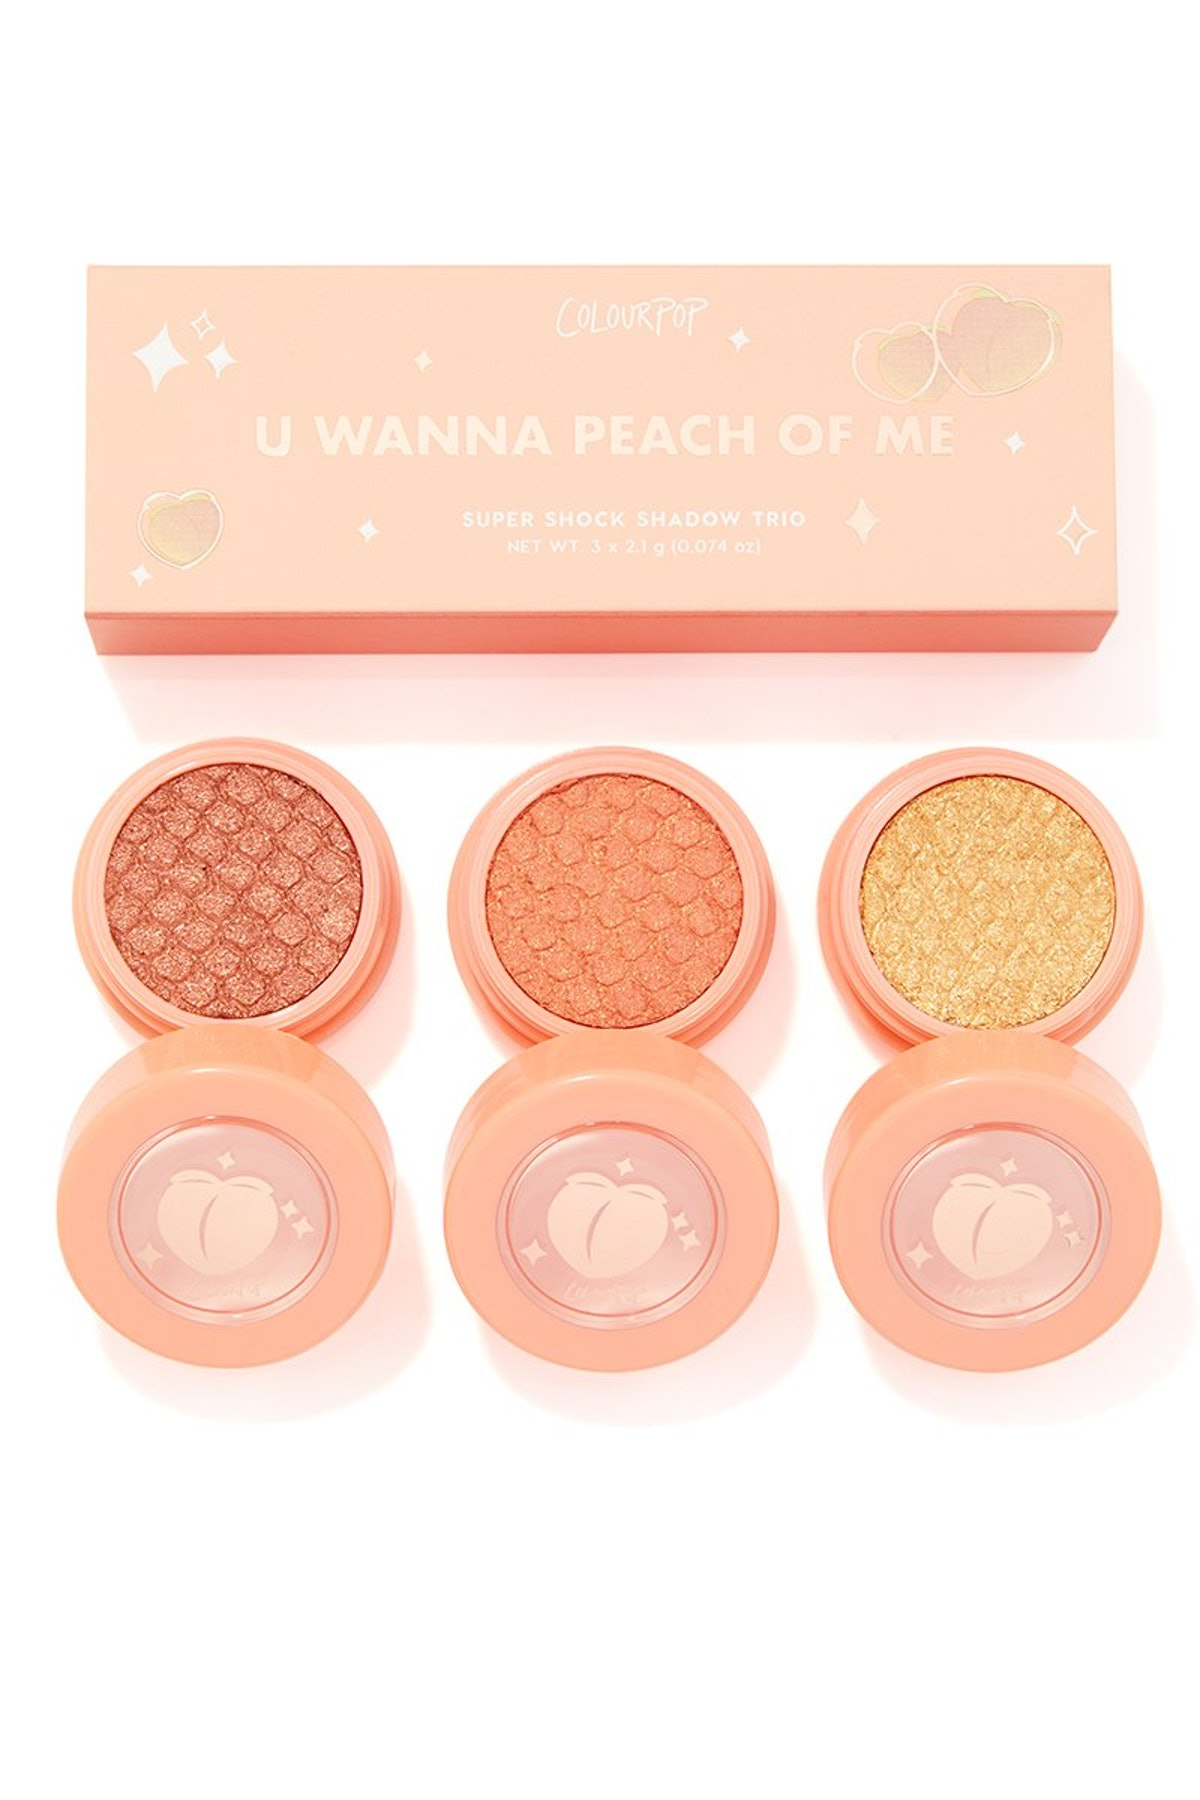 U Wanna Peach Of Me Super Shock Eyeshadow Kit